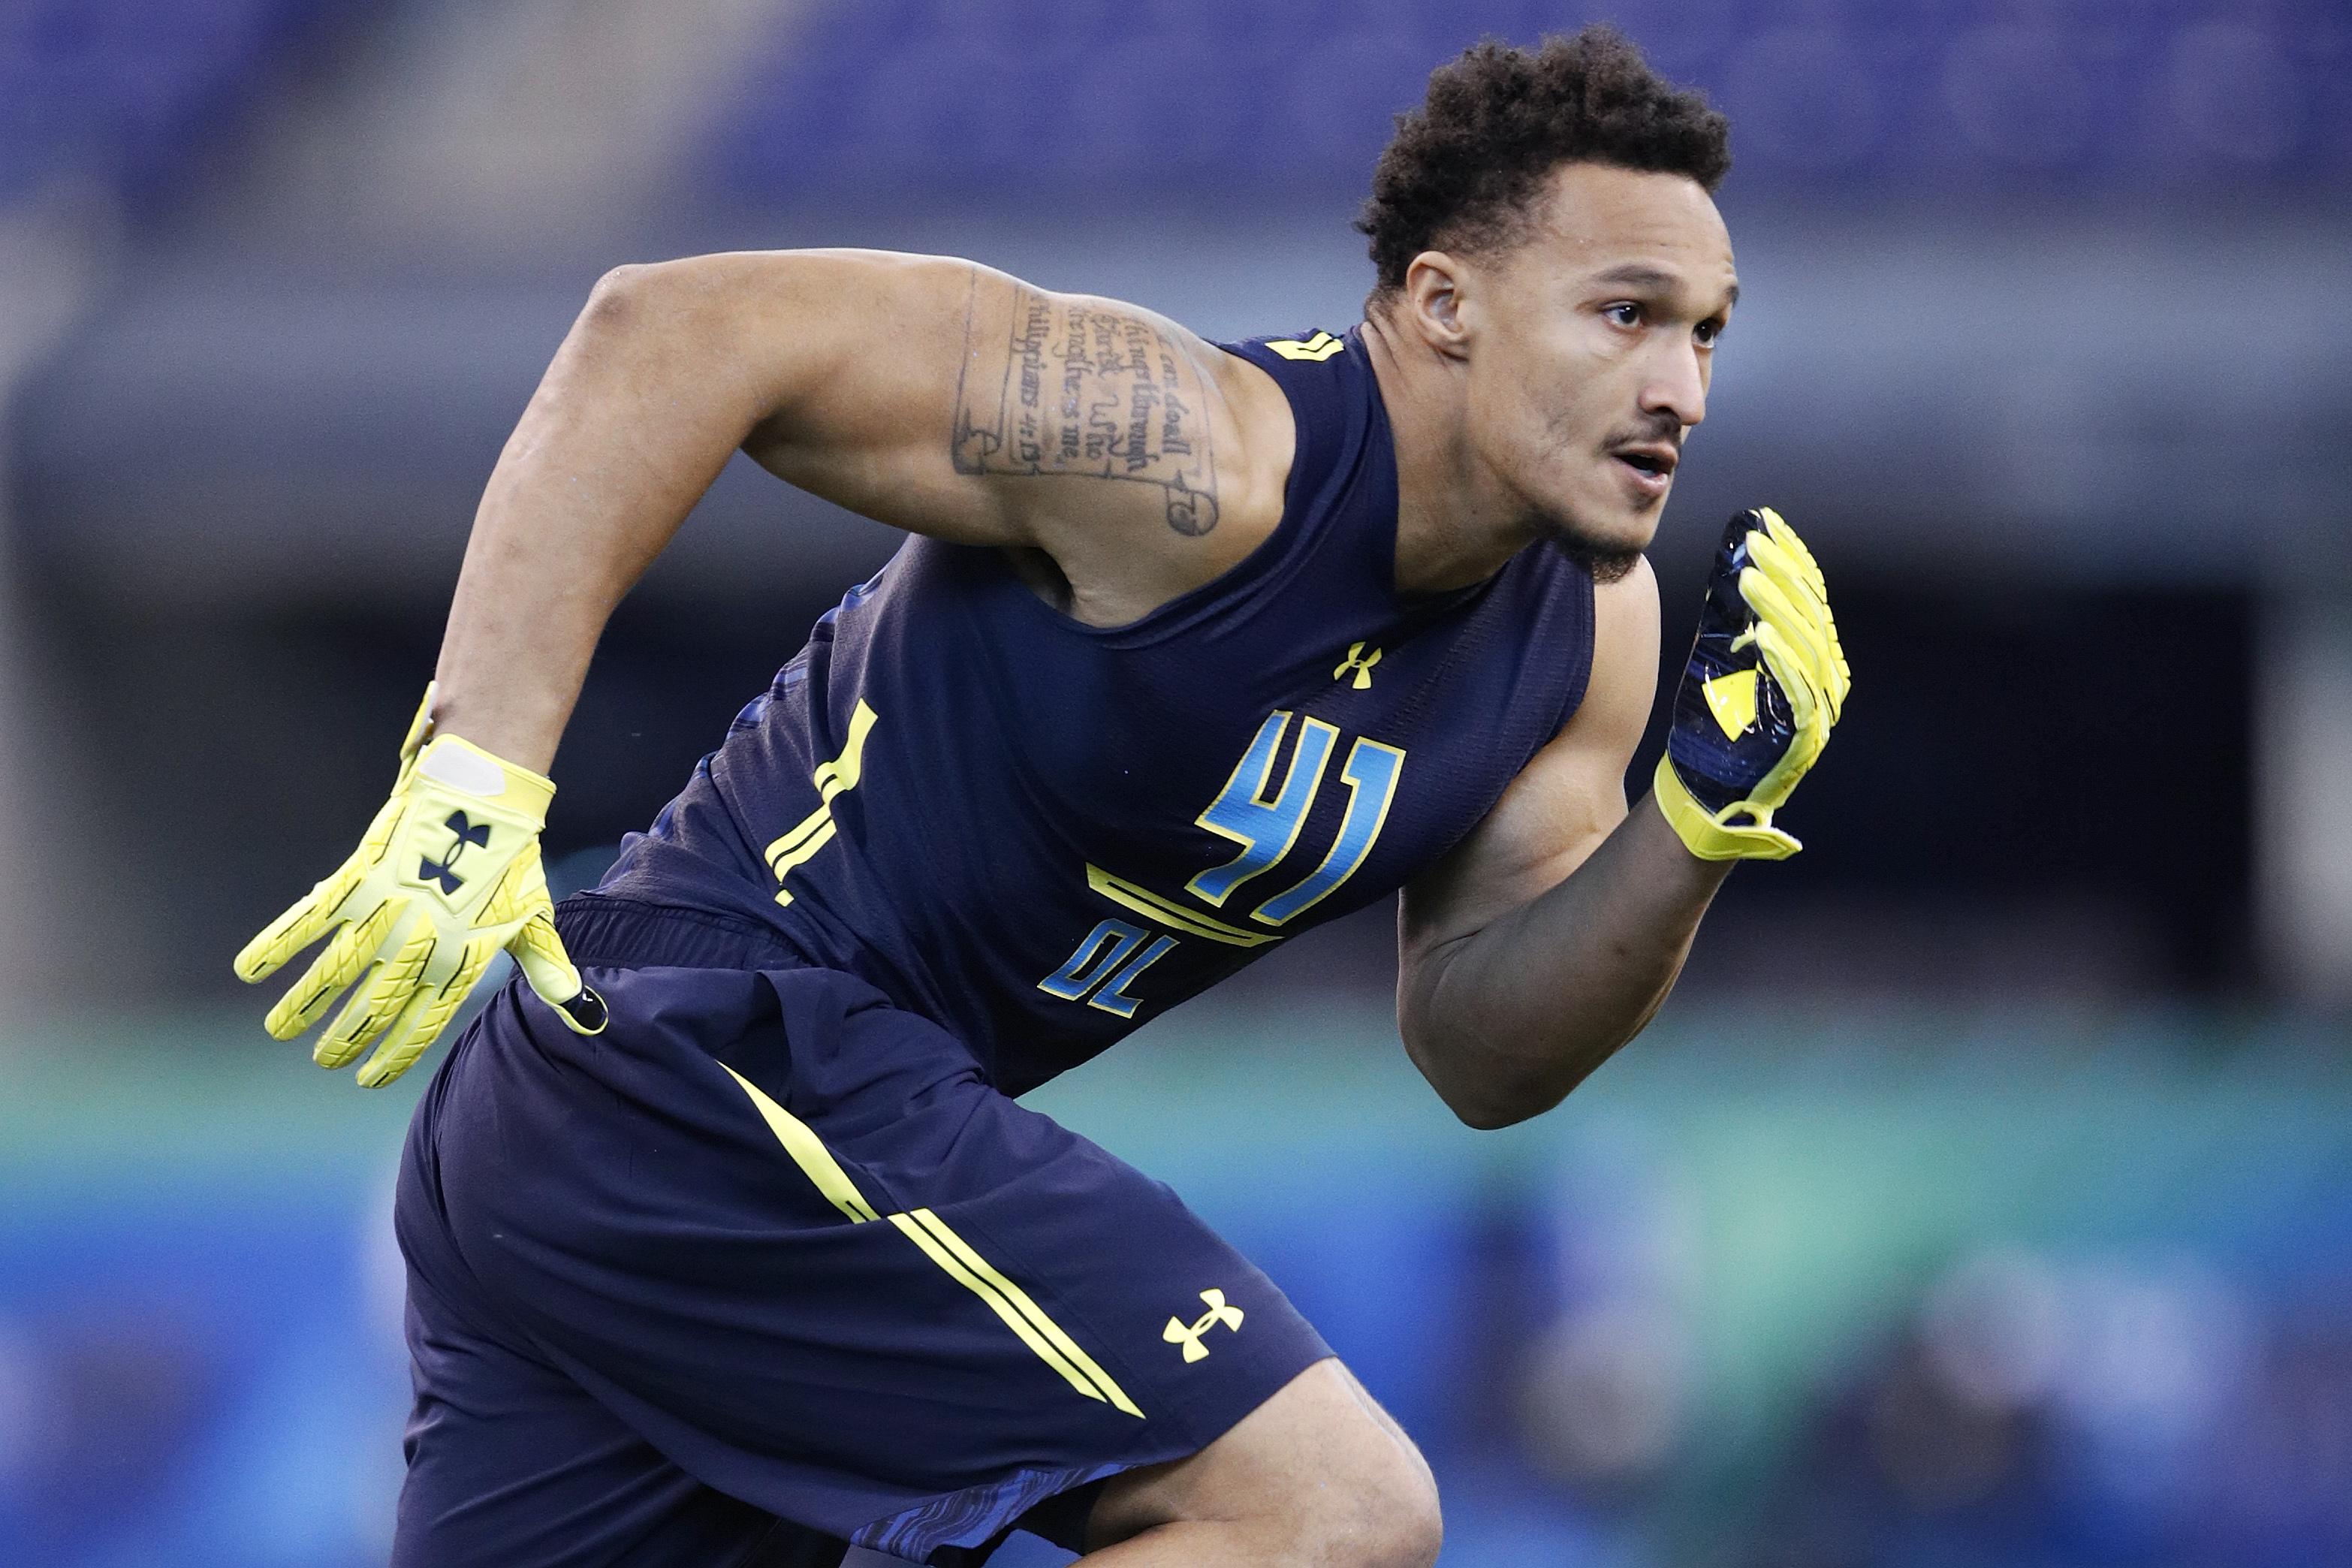 New England Patriots 2017 NFL Draft Wrap-Up